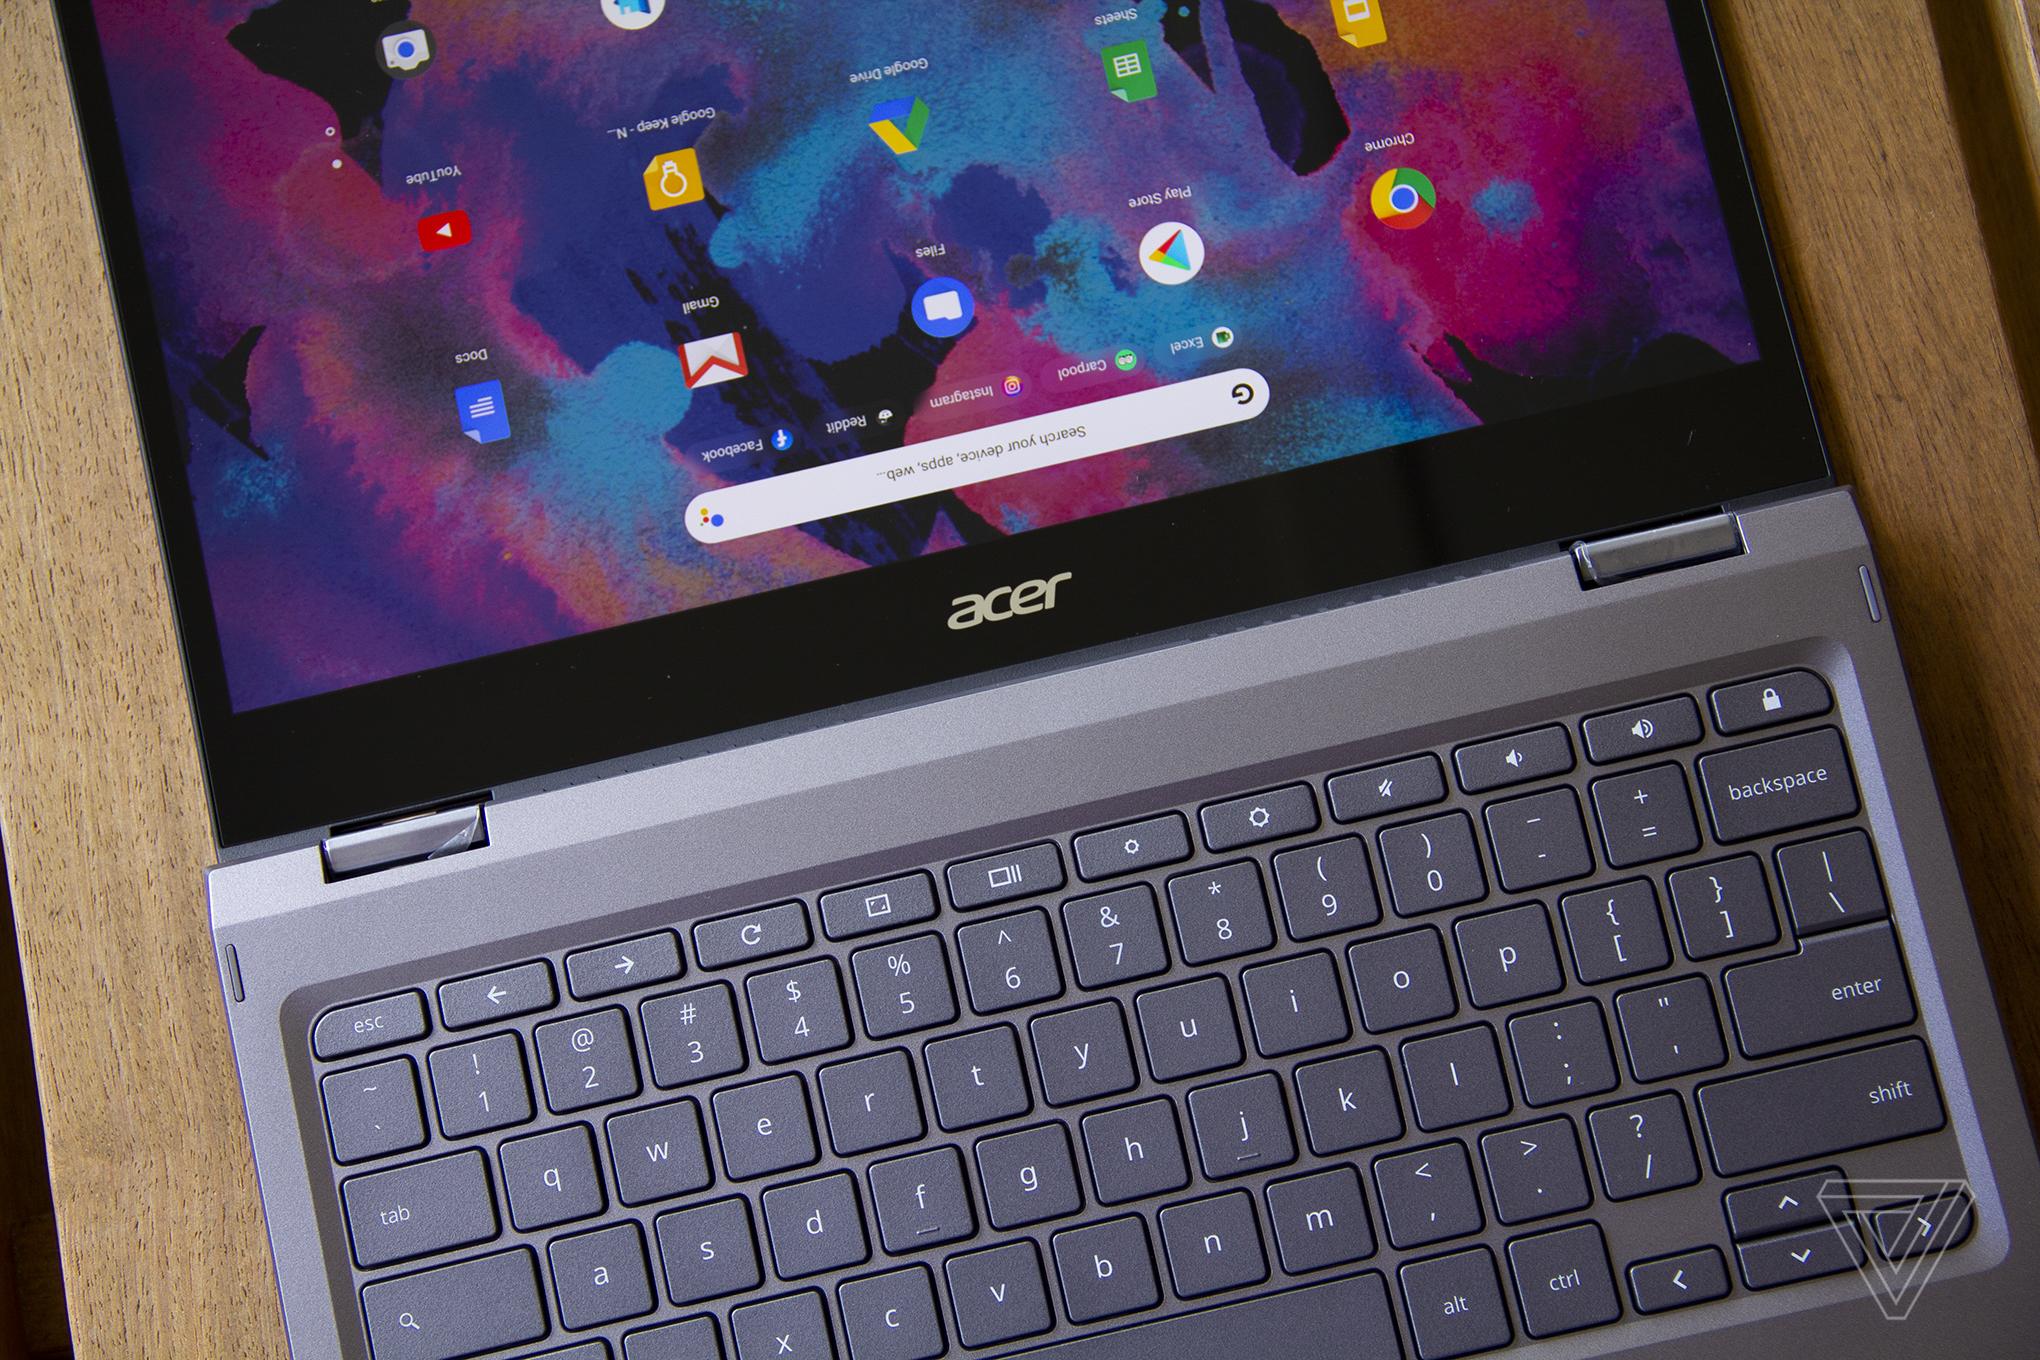 Best Chromebook 2020: Acer Chromebook Spin 713